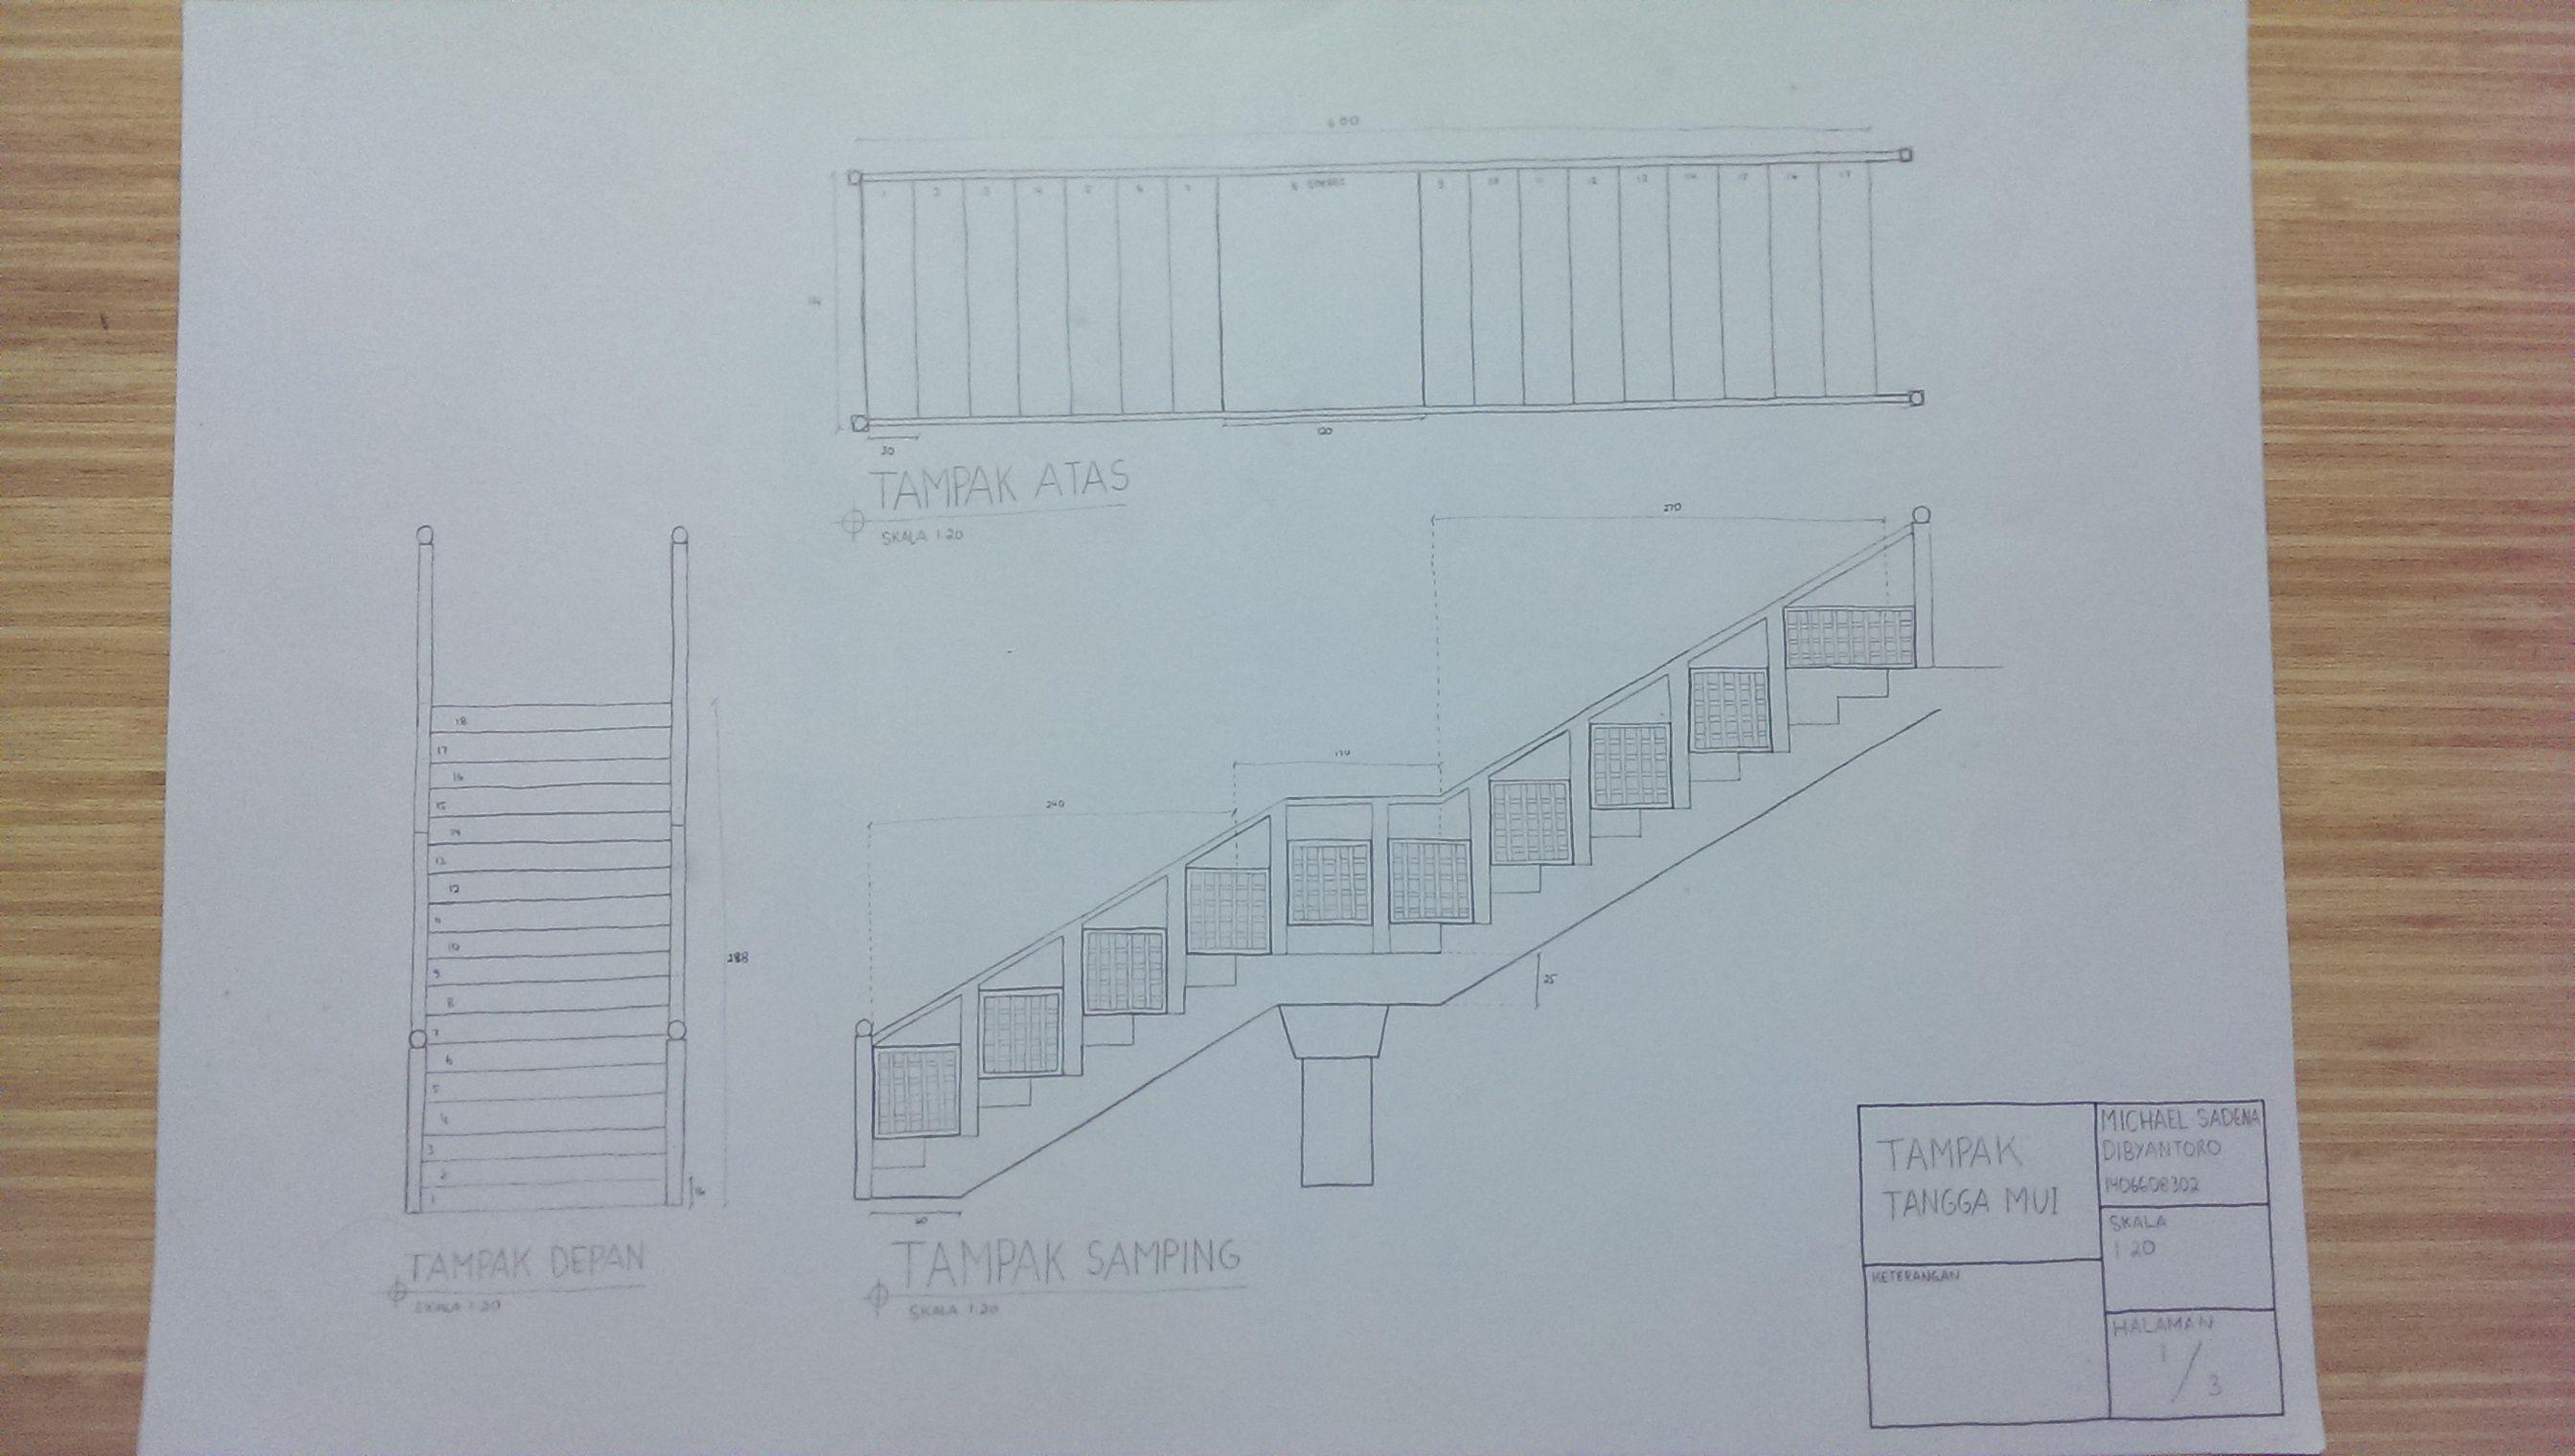 Production Worksheet